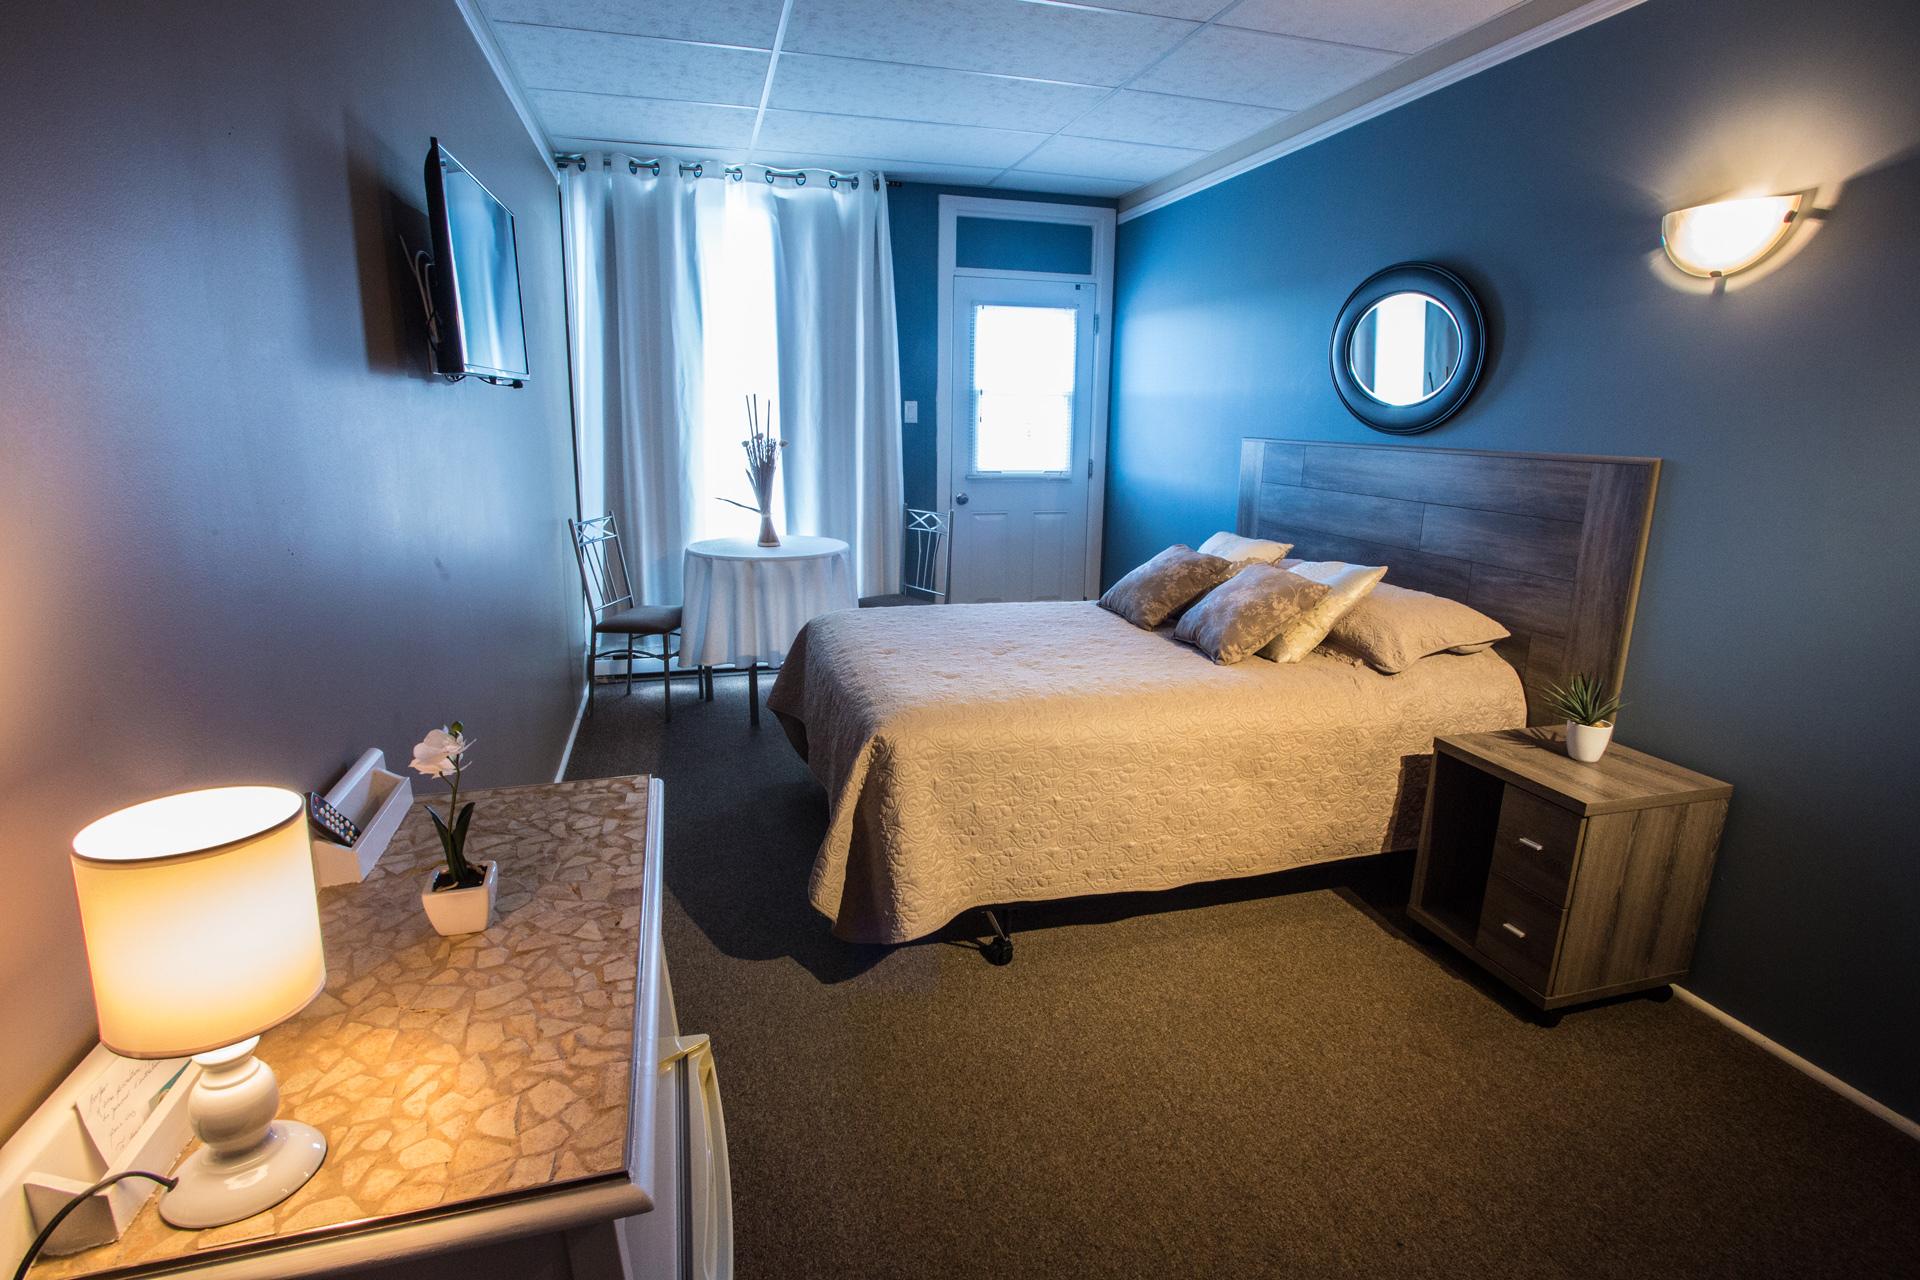 Chambre 1 lit 2 places motel nanook for Chambre 2 lits